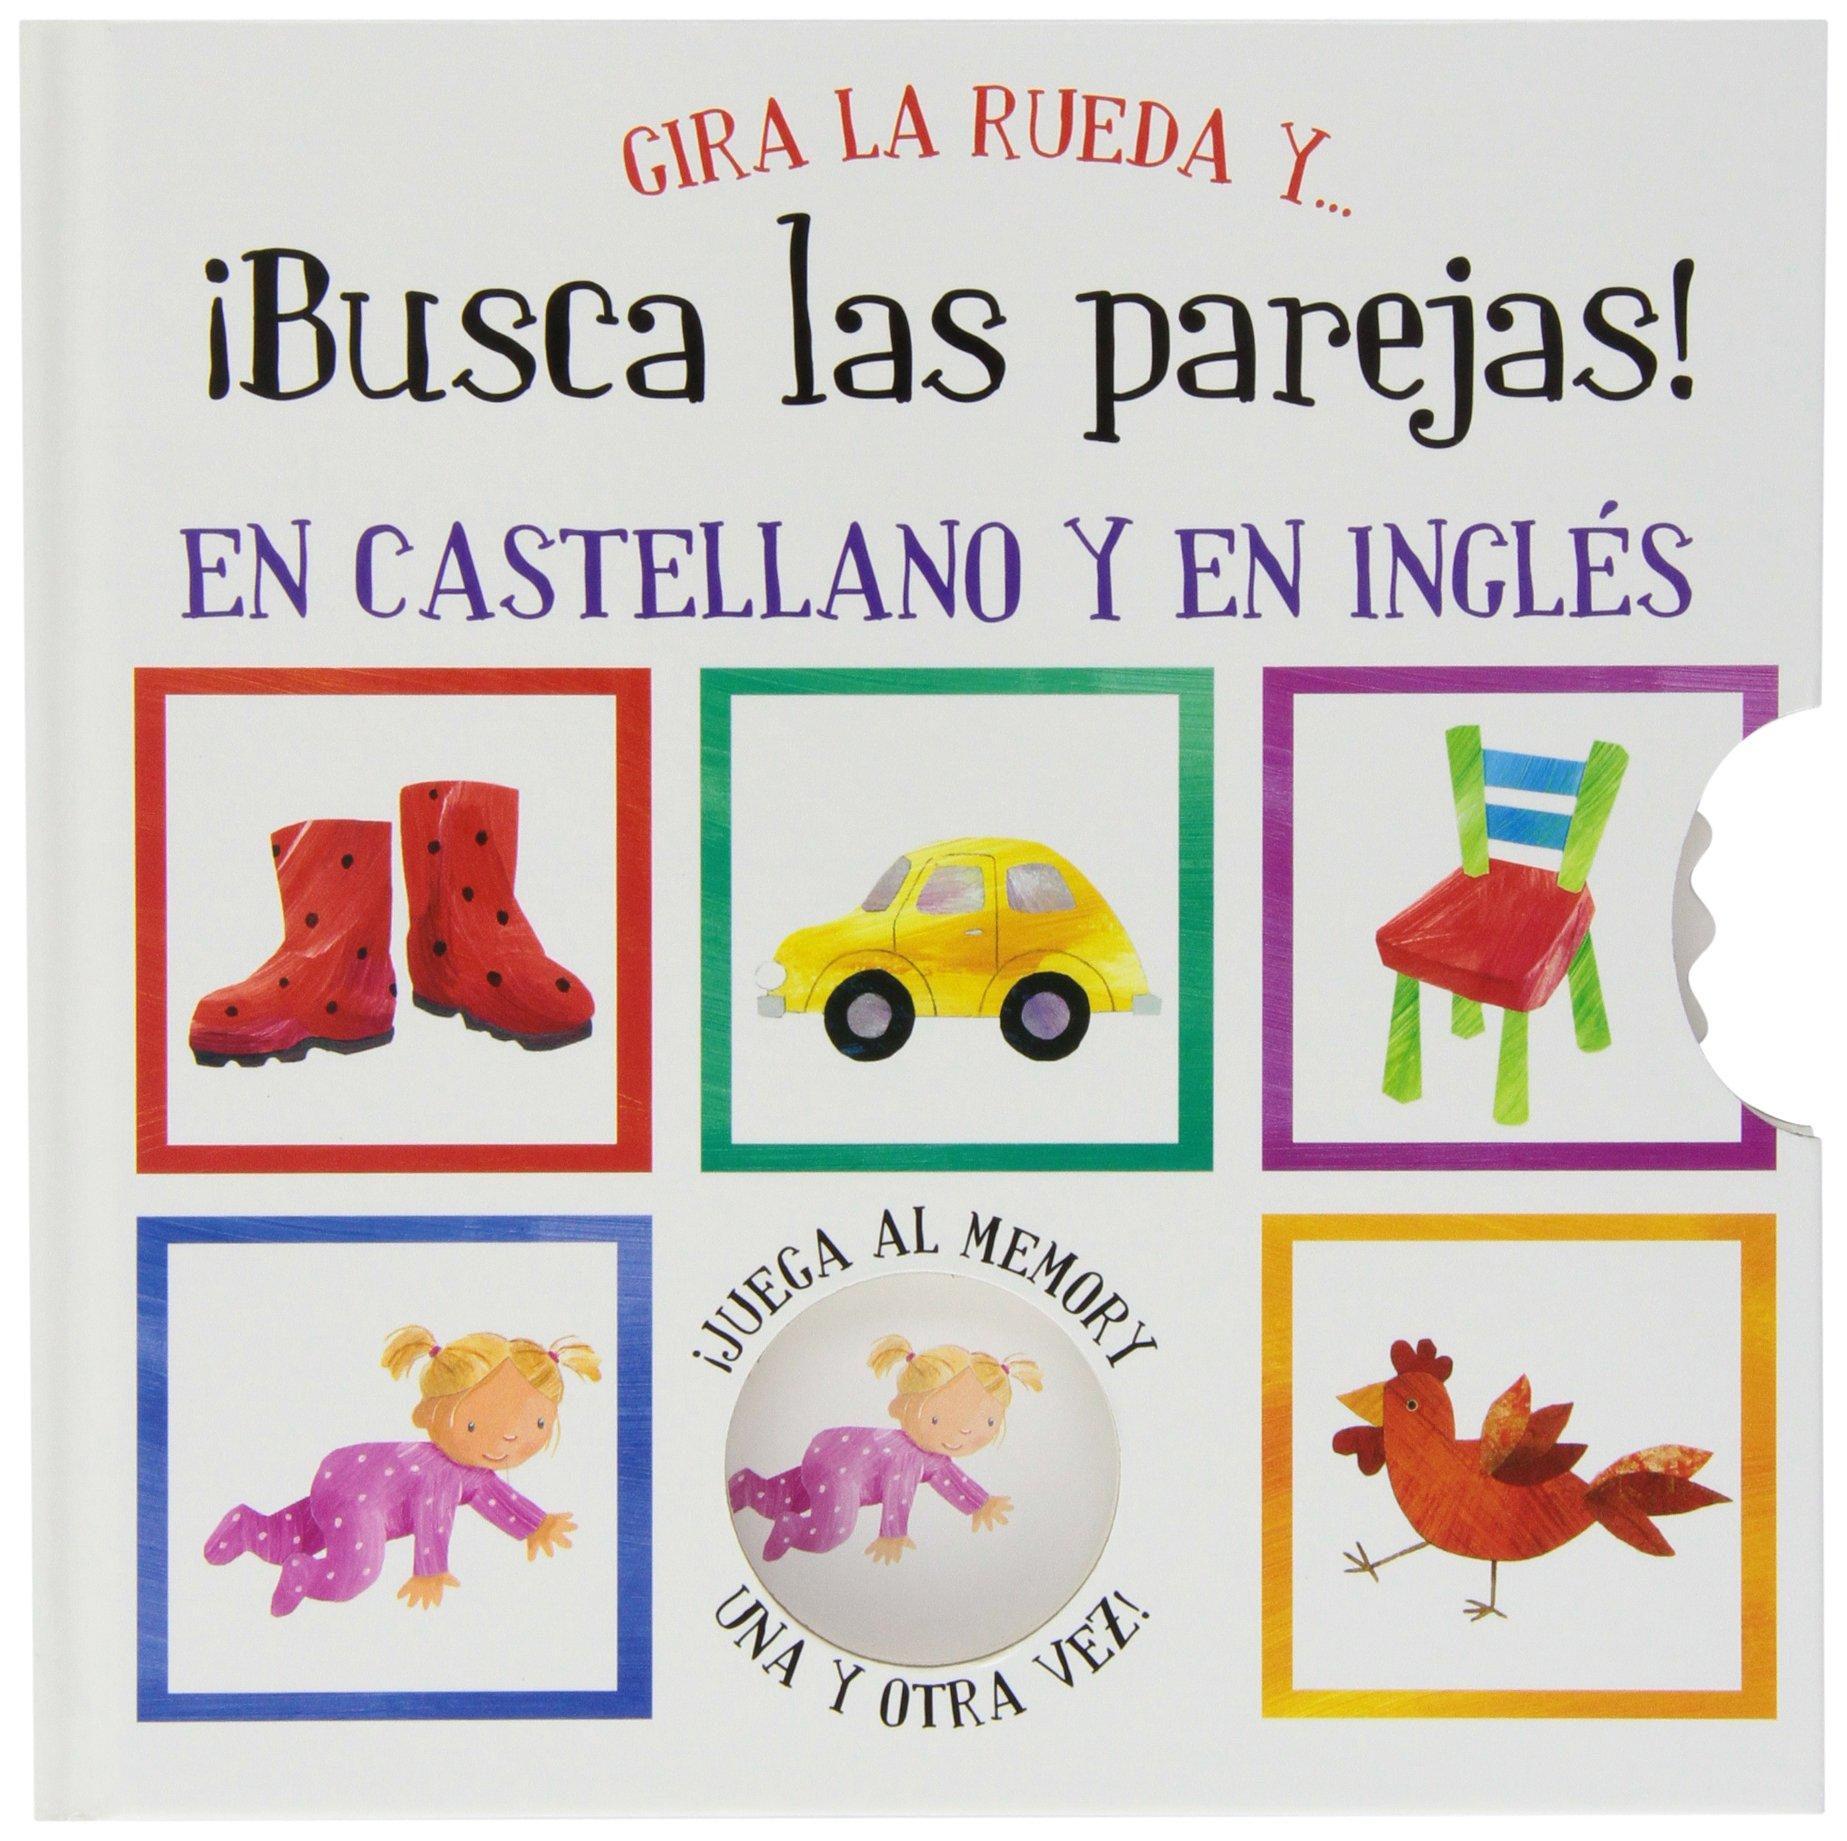 Gira la rueda y... ¡busca las parejas! / Mix and Match (Spanish and English Edition) Hardcover – October 30, 2013